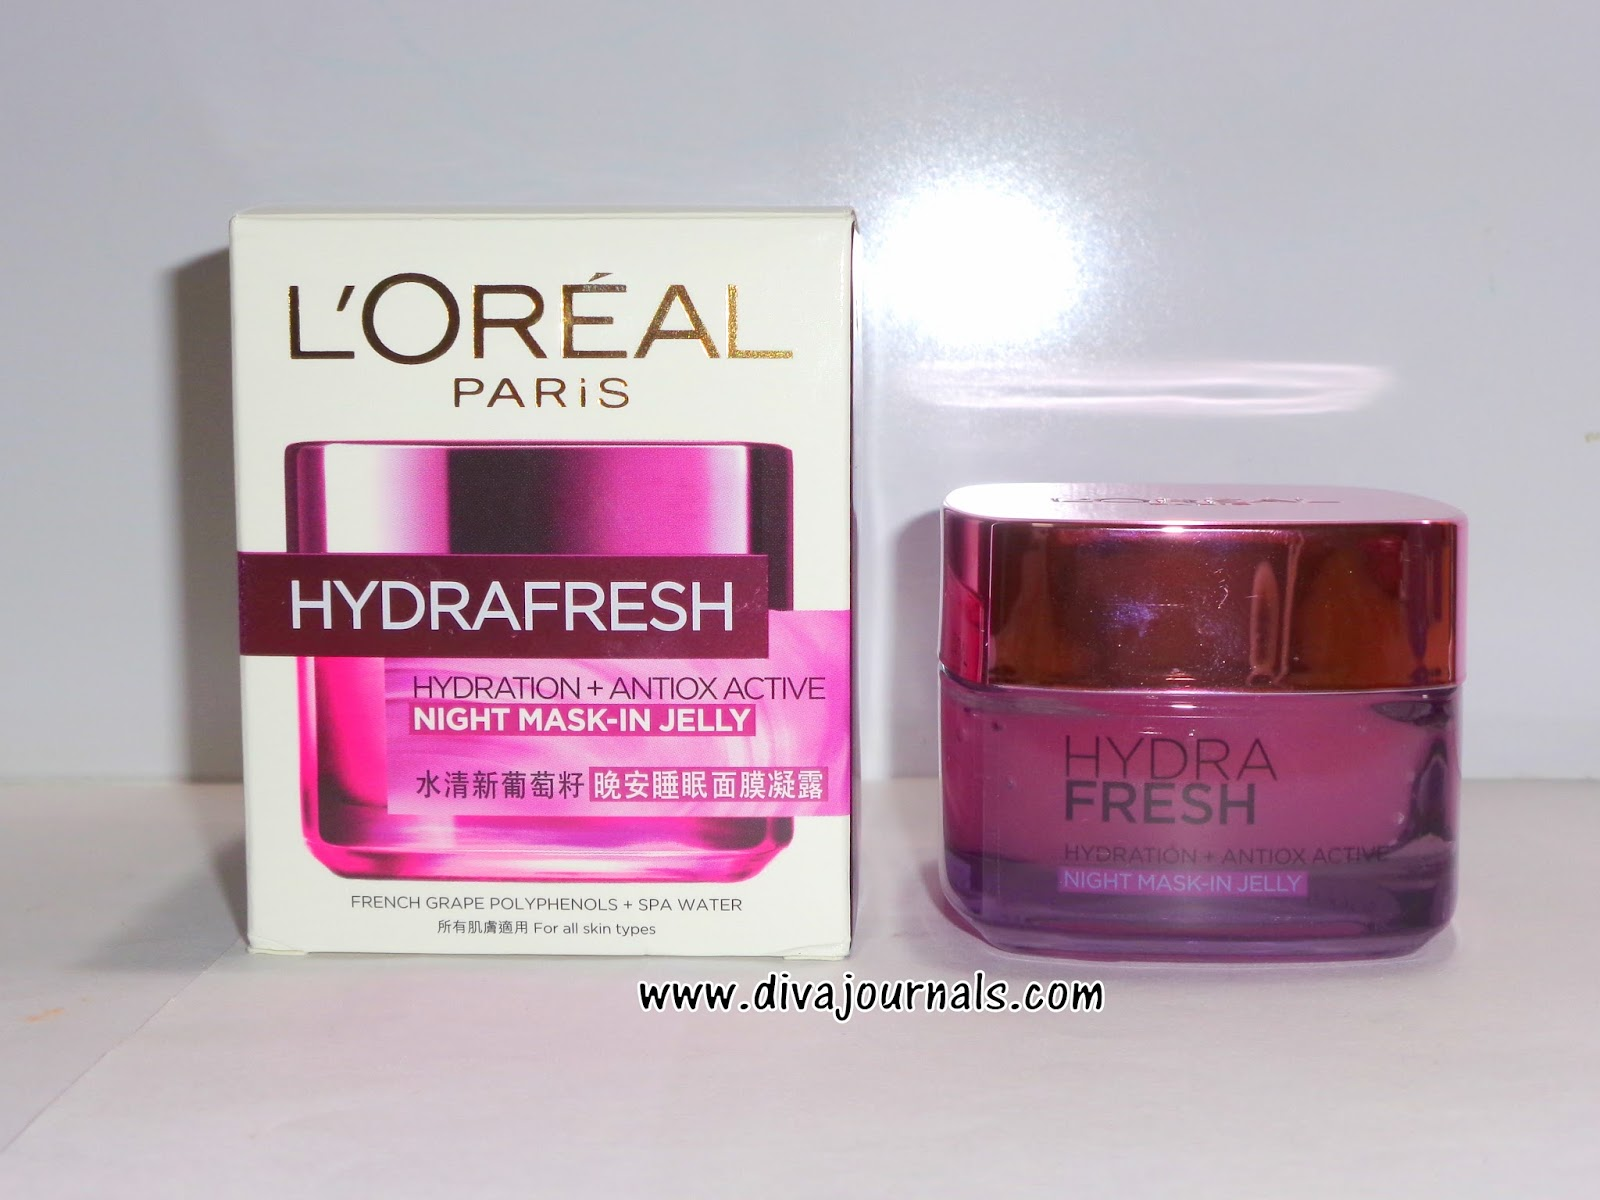 L'Oréal Paris Hydra Fresh Hydration+ Antiox Active Supreme Emulsion uploaded by Carla🌻